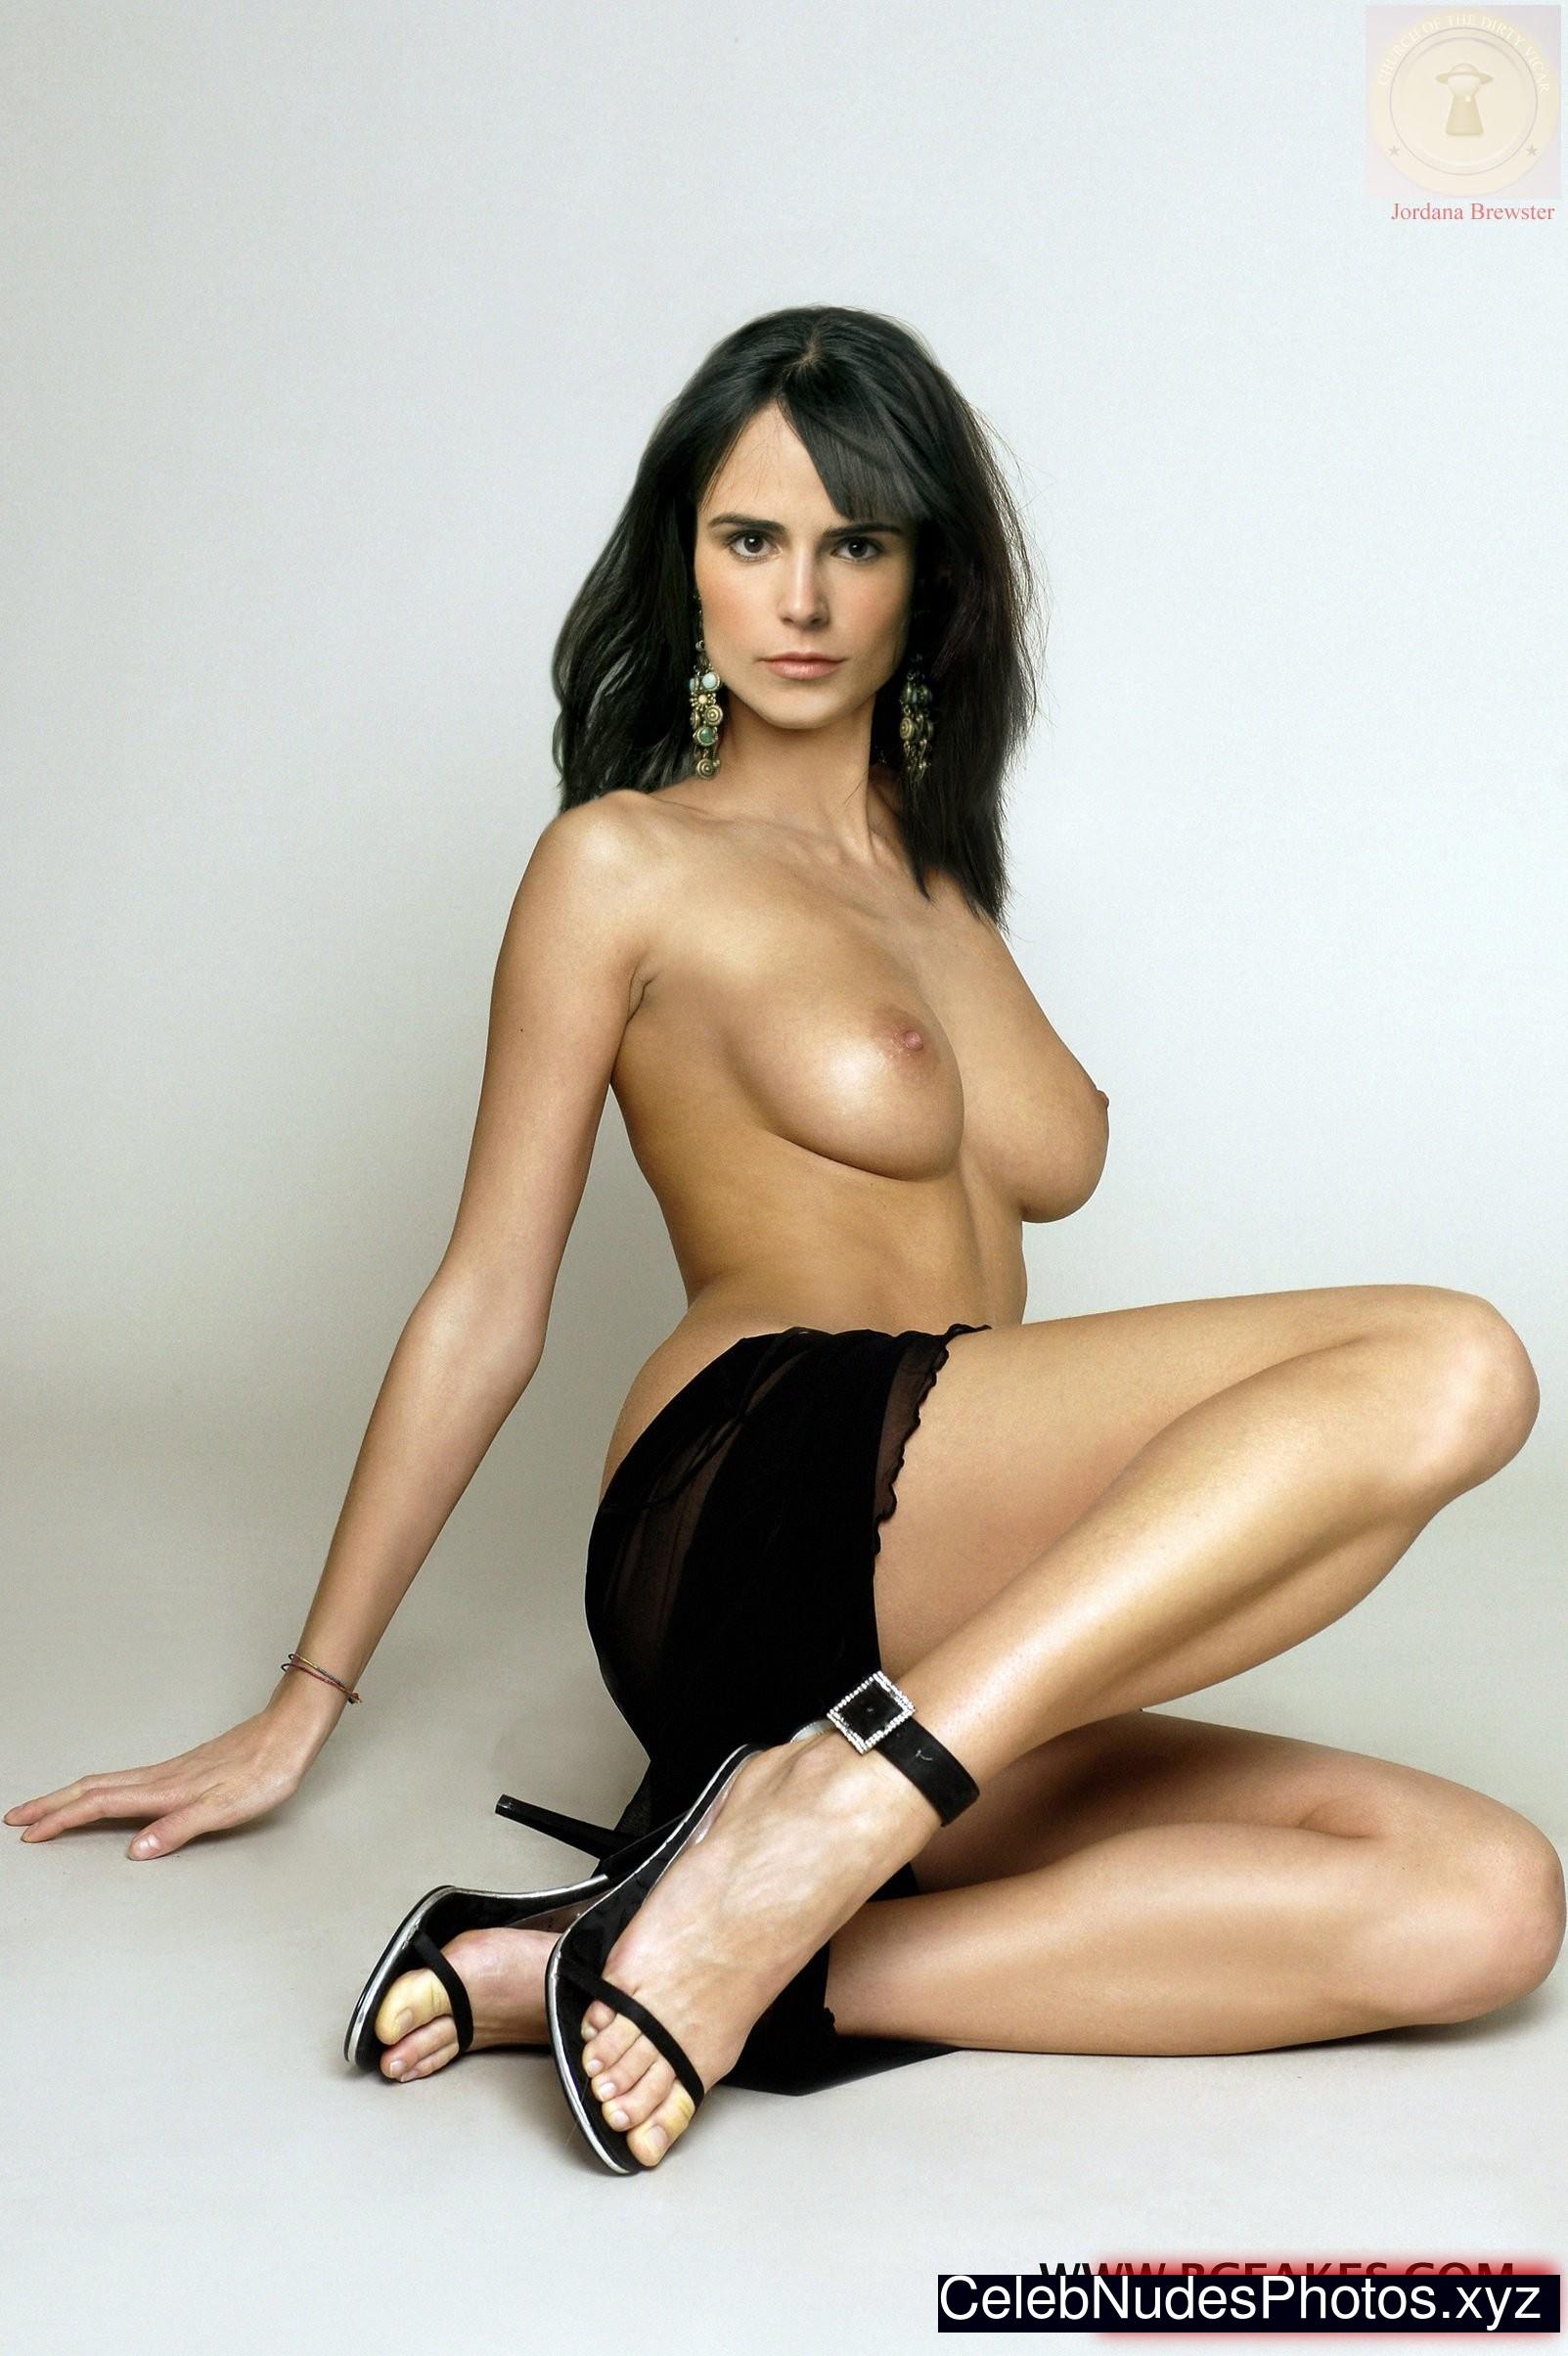 jordana brewster photo gallery naked